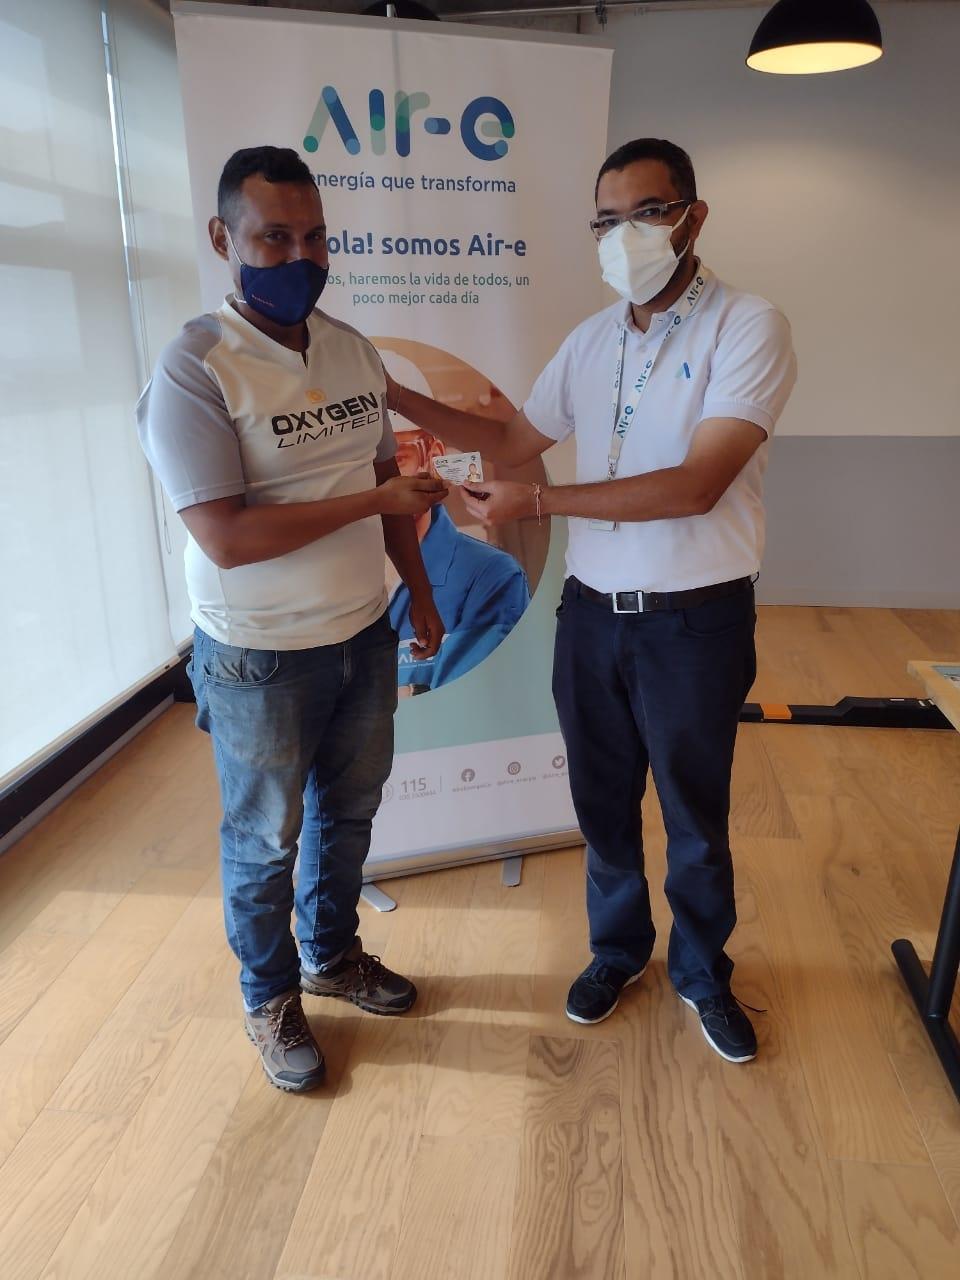 Air-e entregó tarjetas Conte a técnicos electricistas en redes de baja tensión – @aire_energia